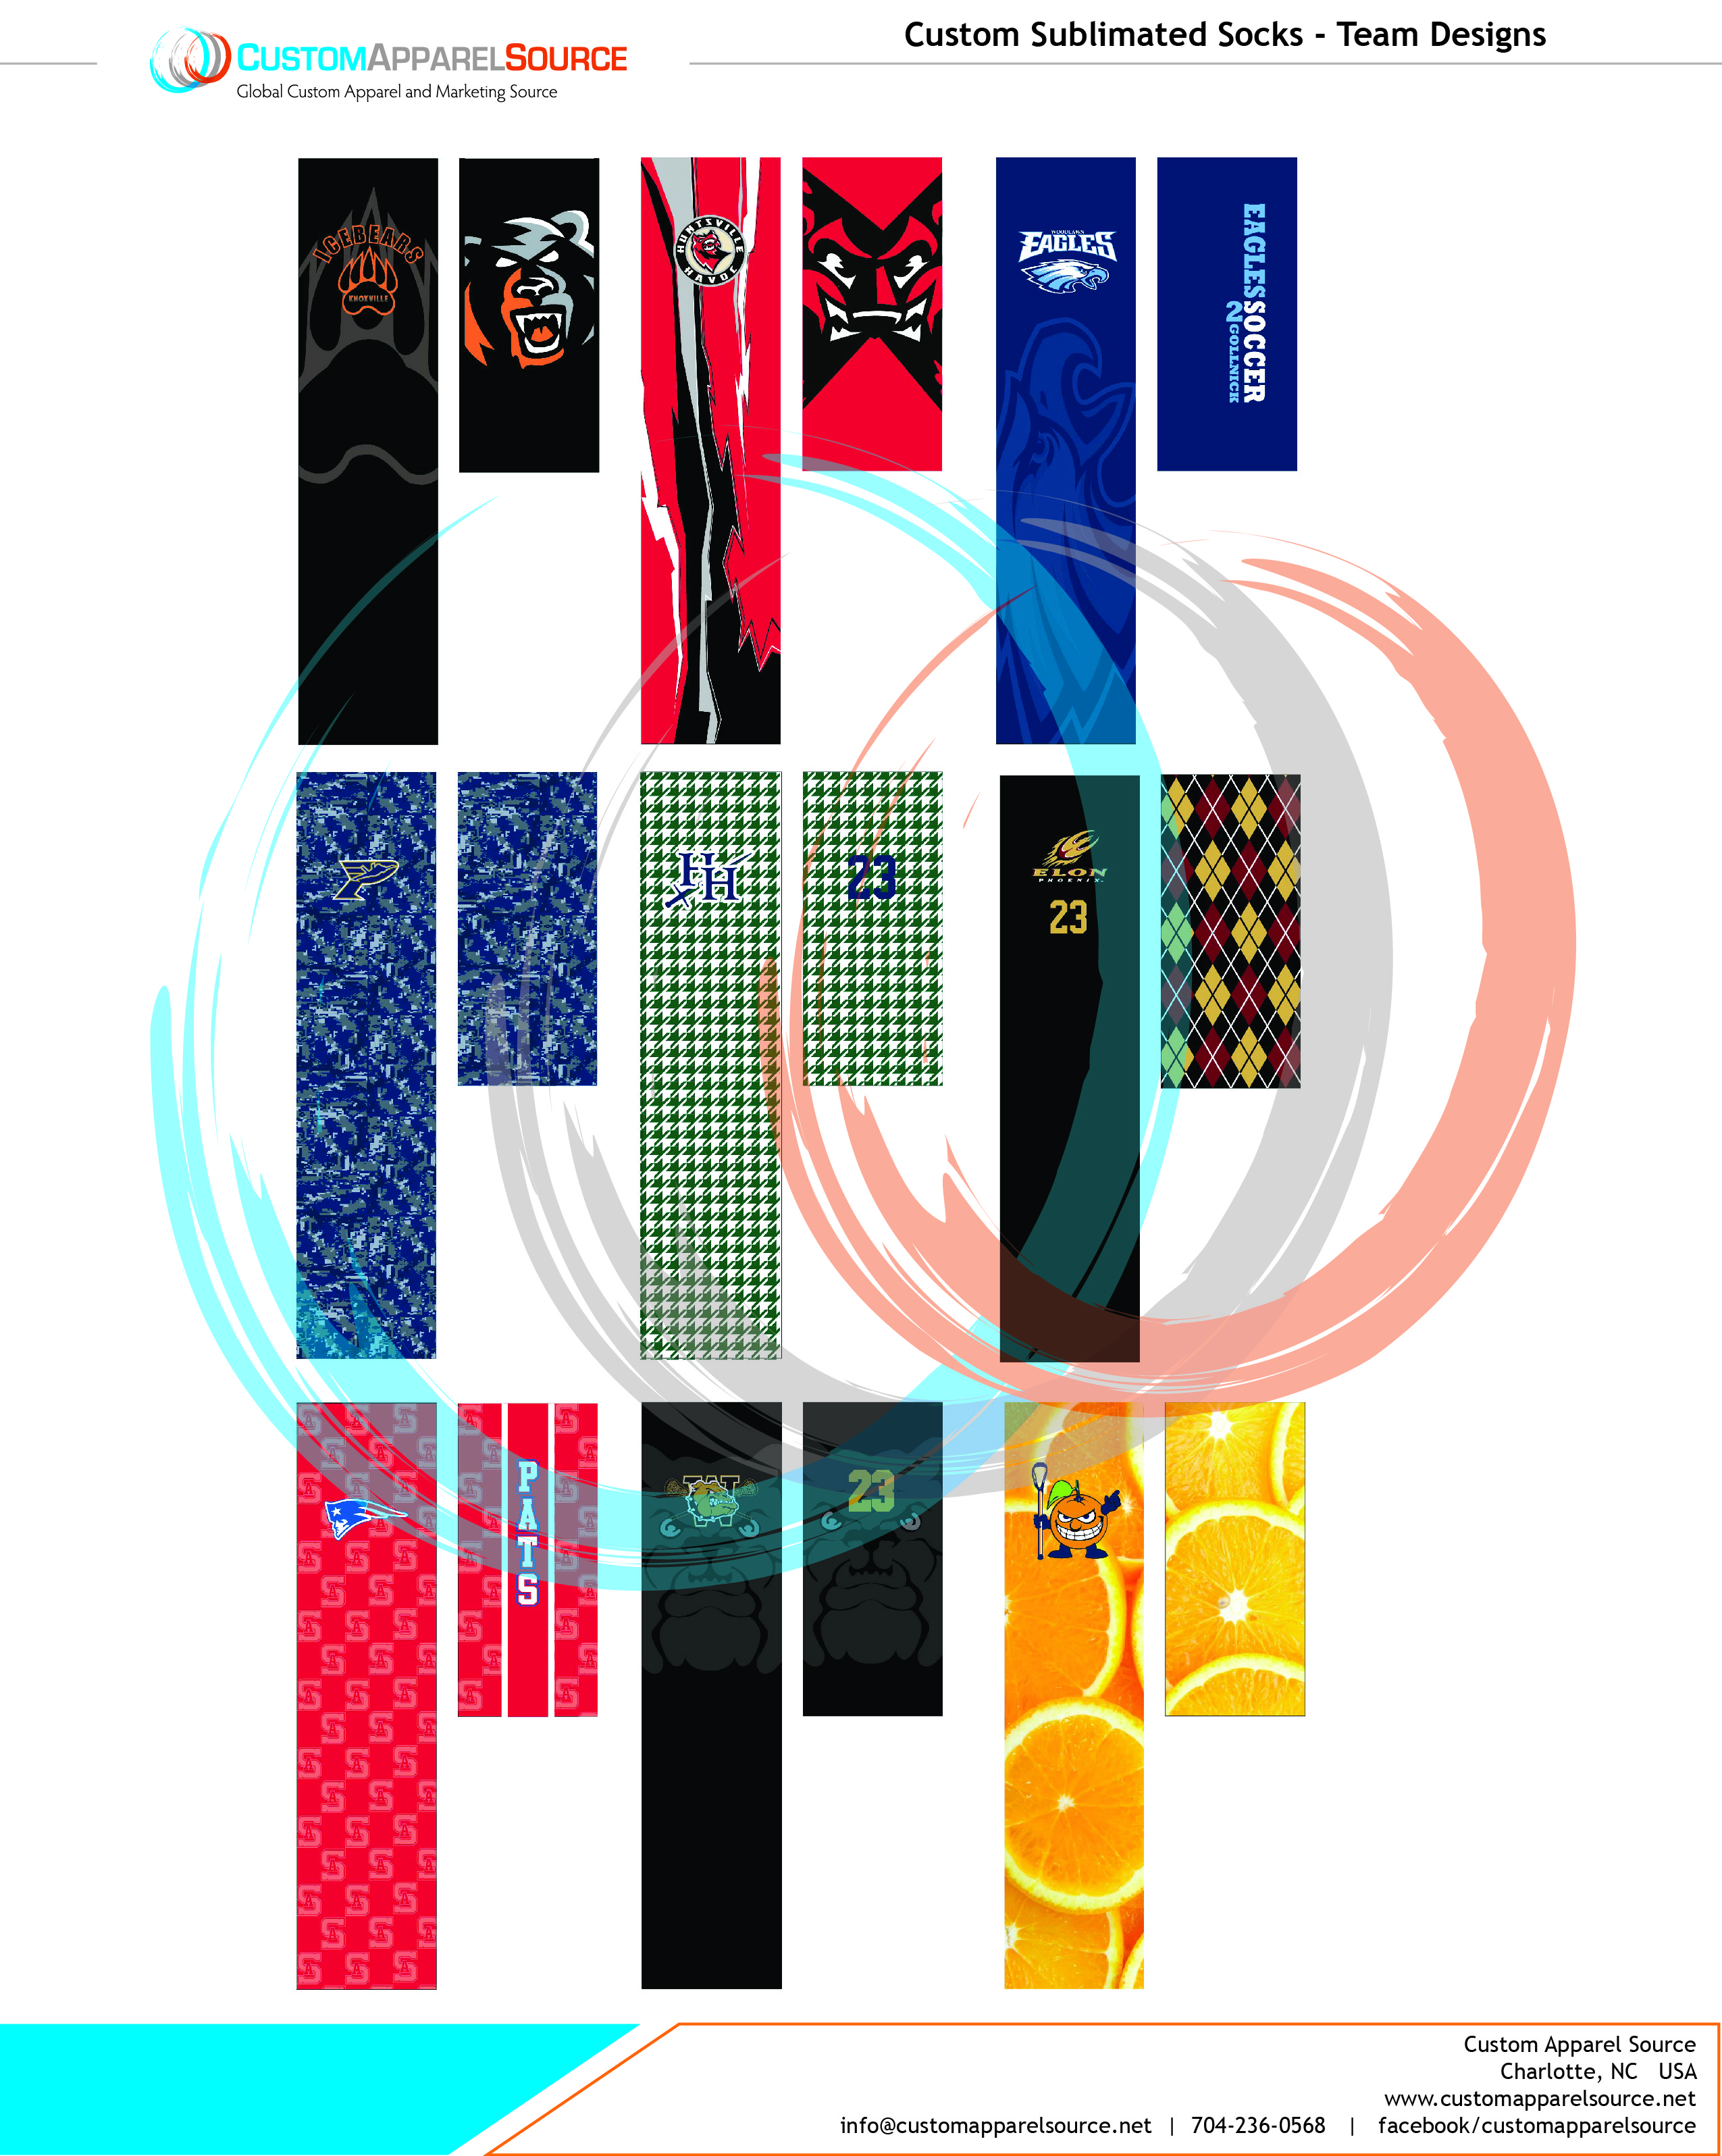 Sublimated Team Sock Designs